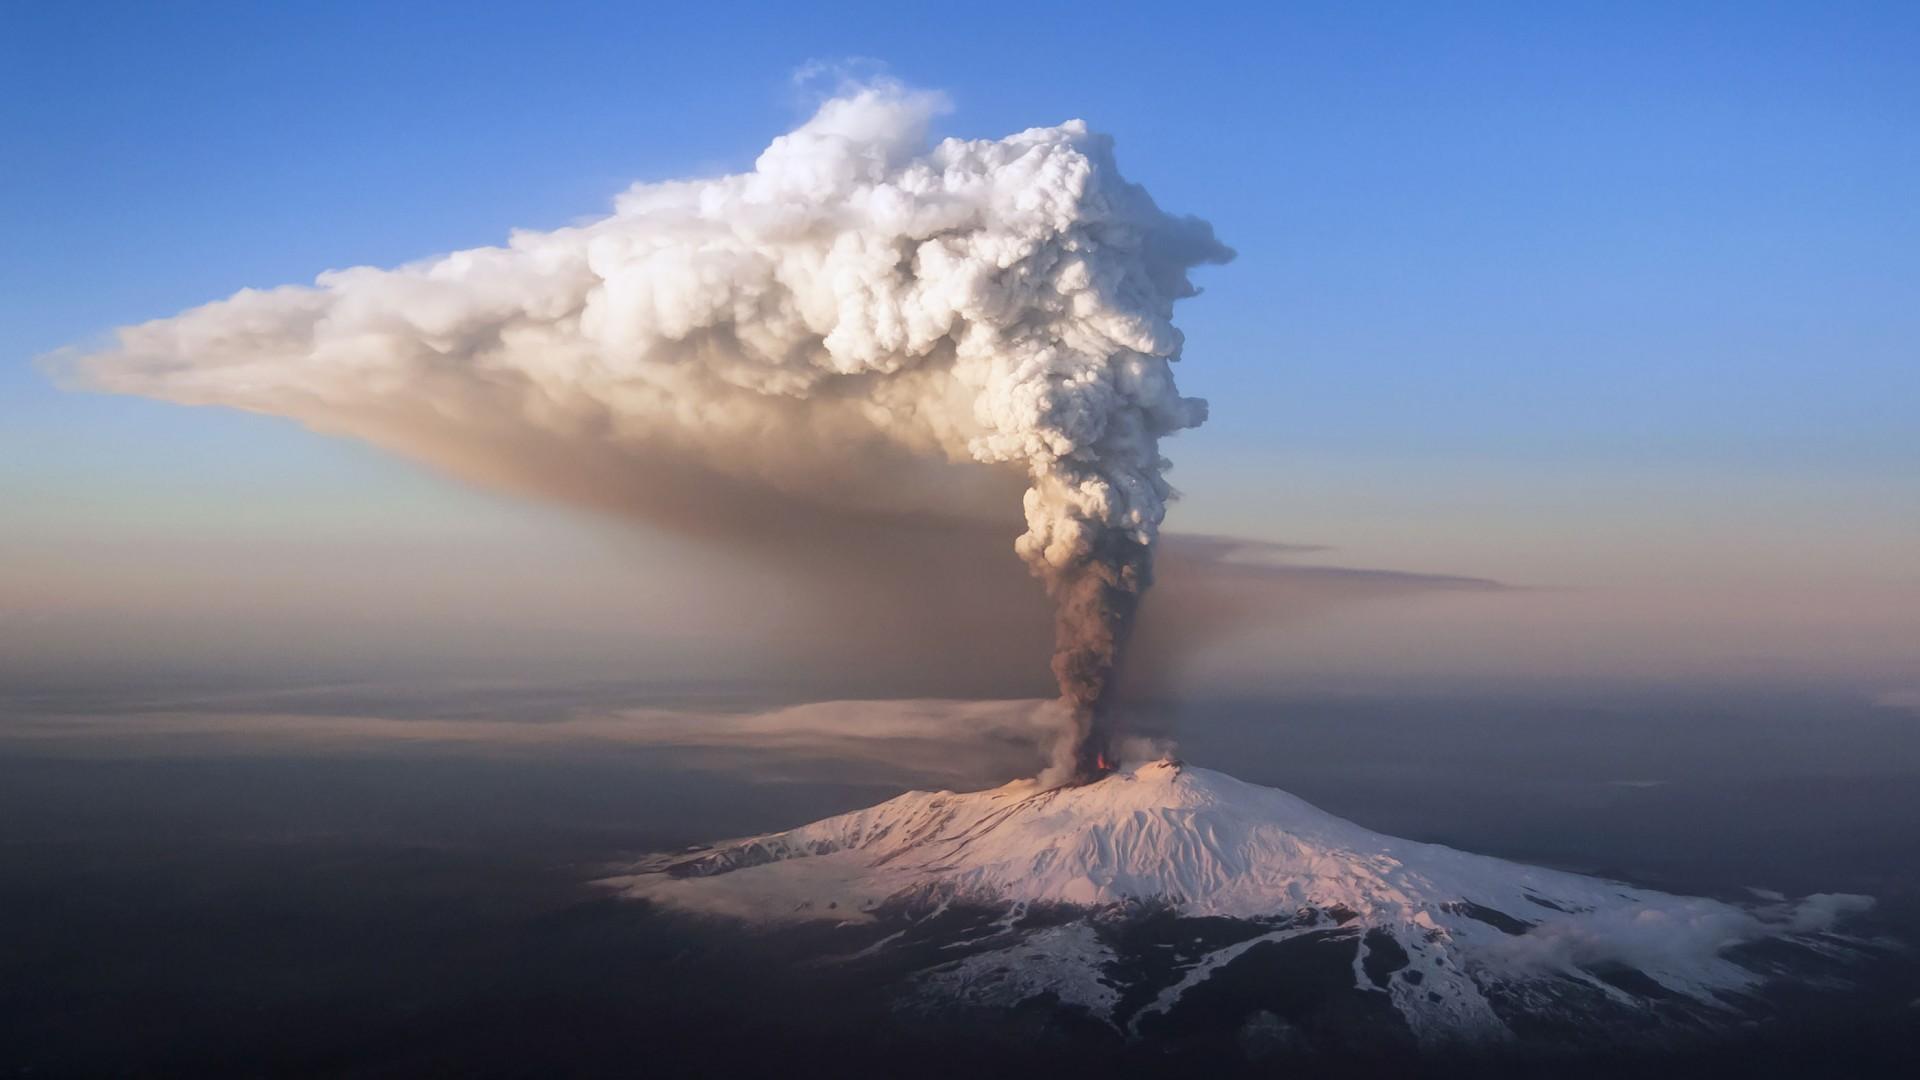 Volcano Eruption wallpaper 1920x1080 136979 WallpaperUP 1920x1080